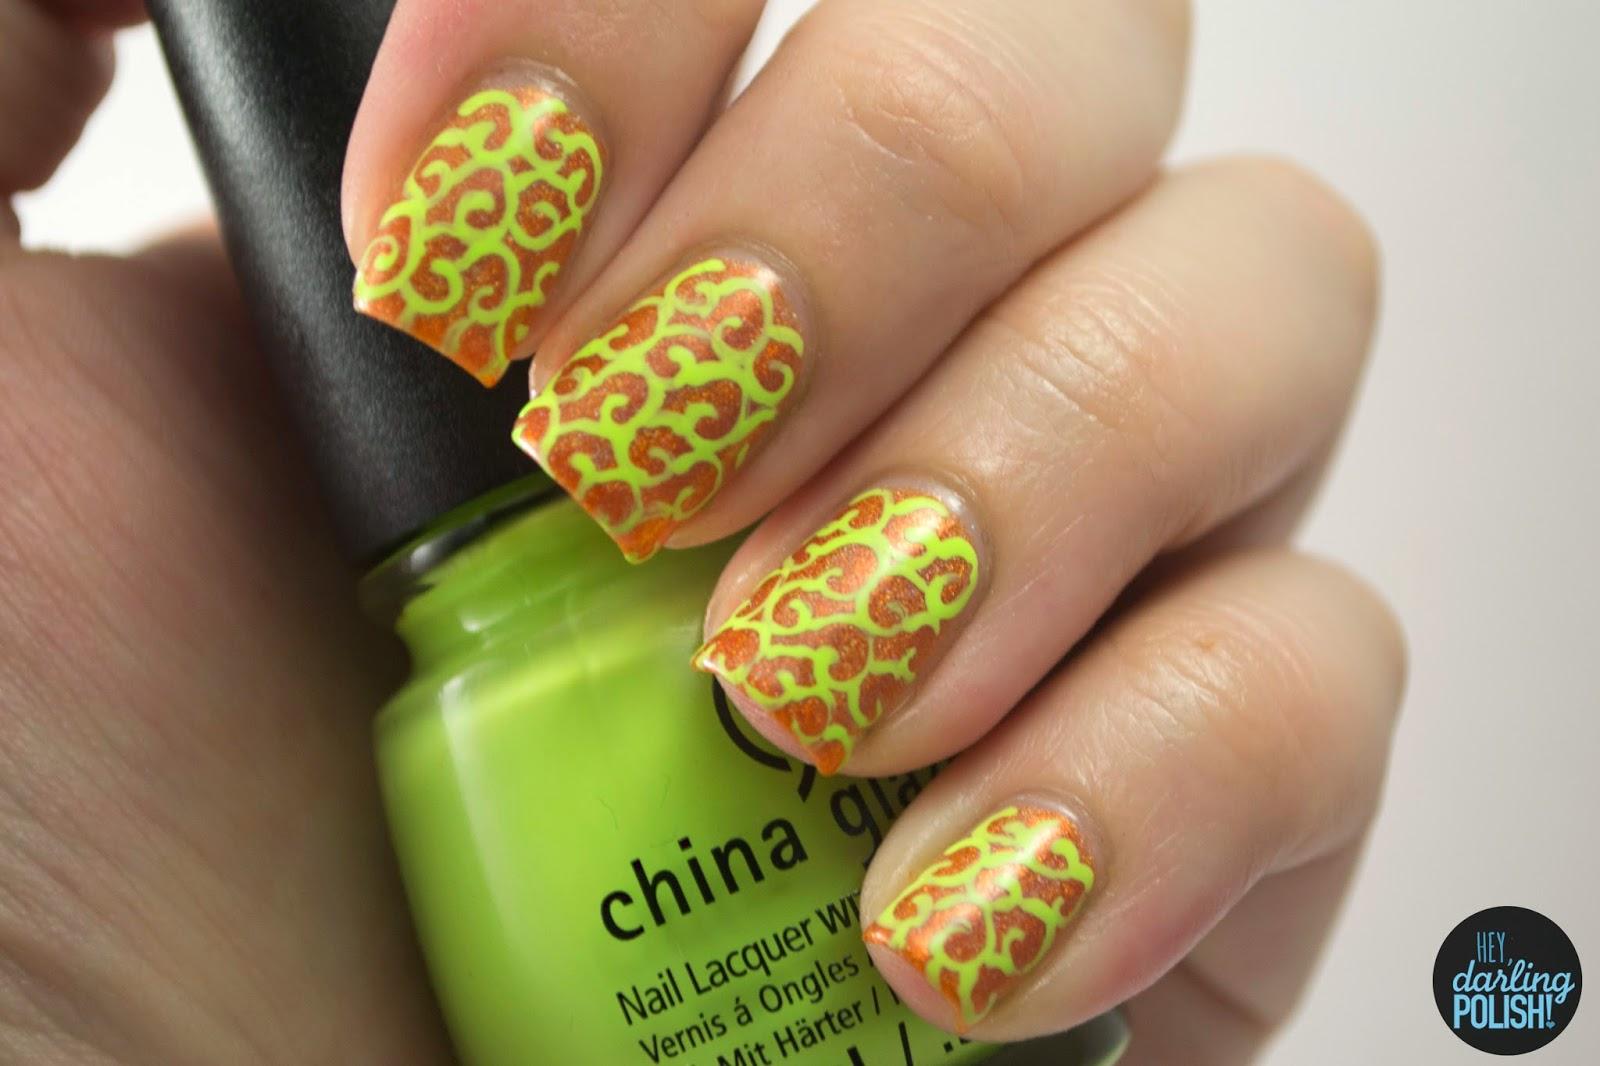 nails, nail art, nail polish, polish, indie, indie nail polish, indie polish, lynbdesigns am i ginger?, swirls, hey darling polish, the never ending pile challenge